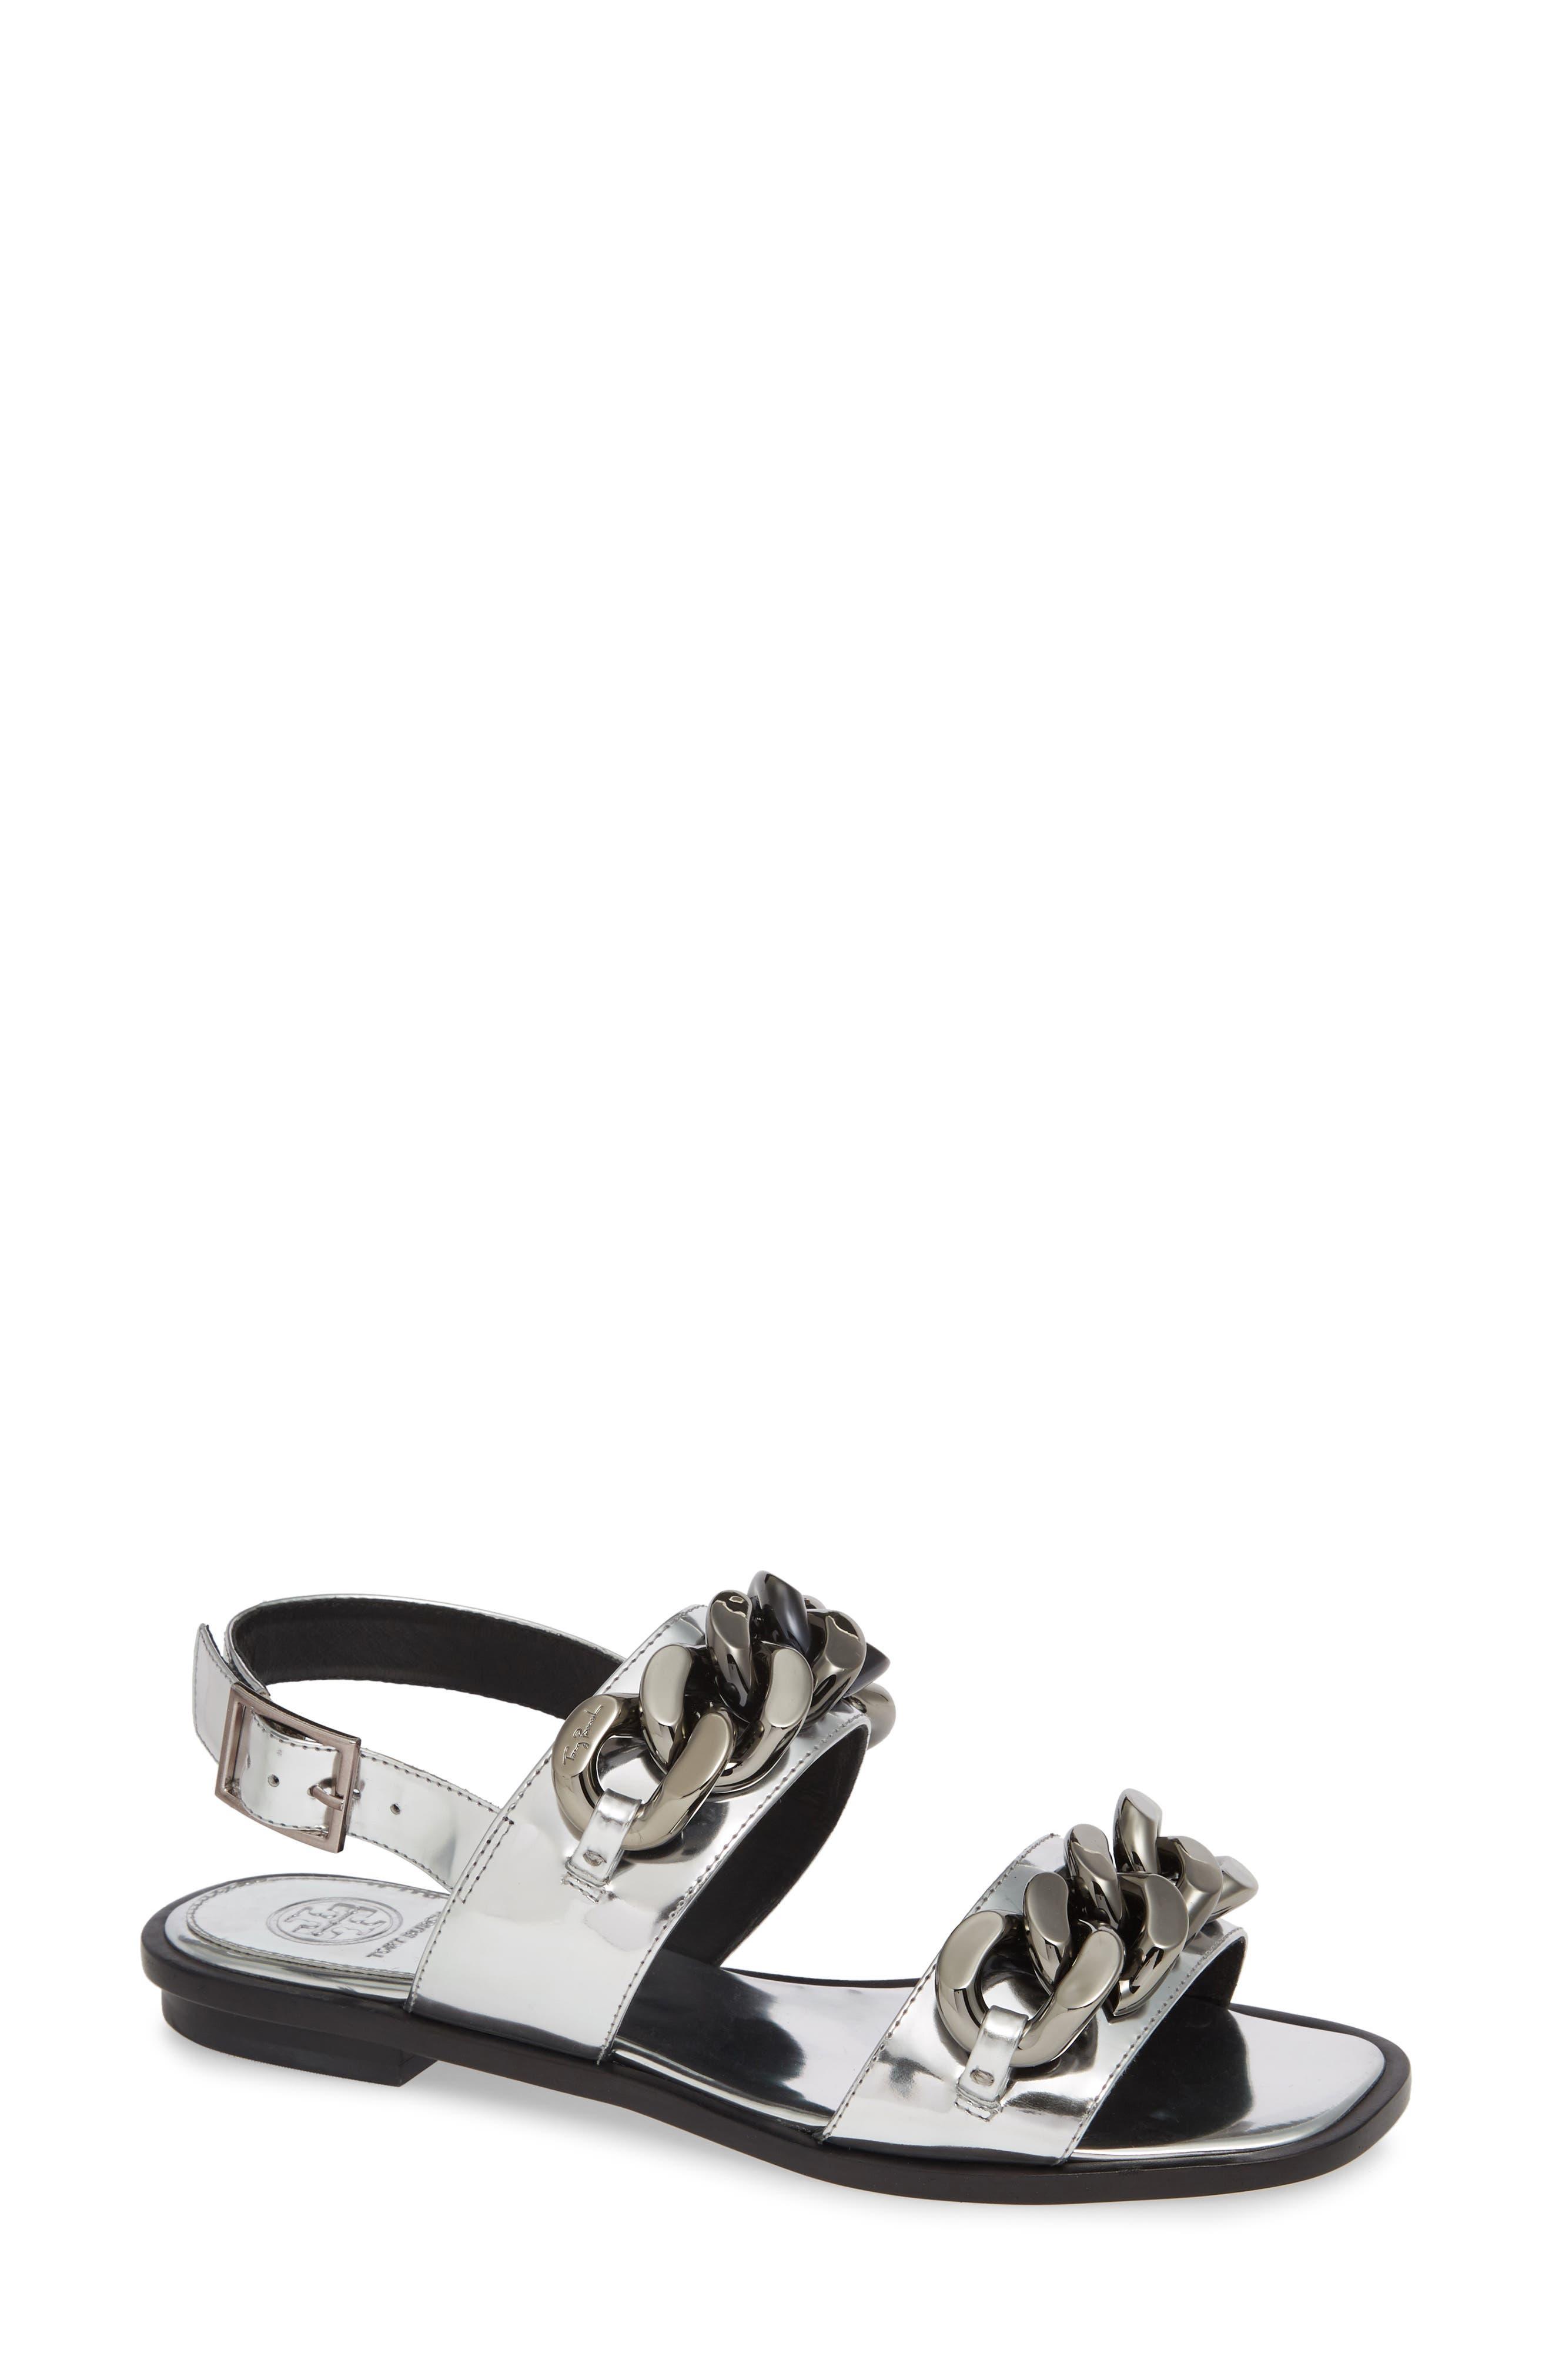 Tory Burch Adrien Chain Sandal- Metallic